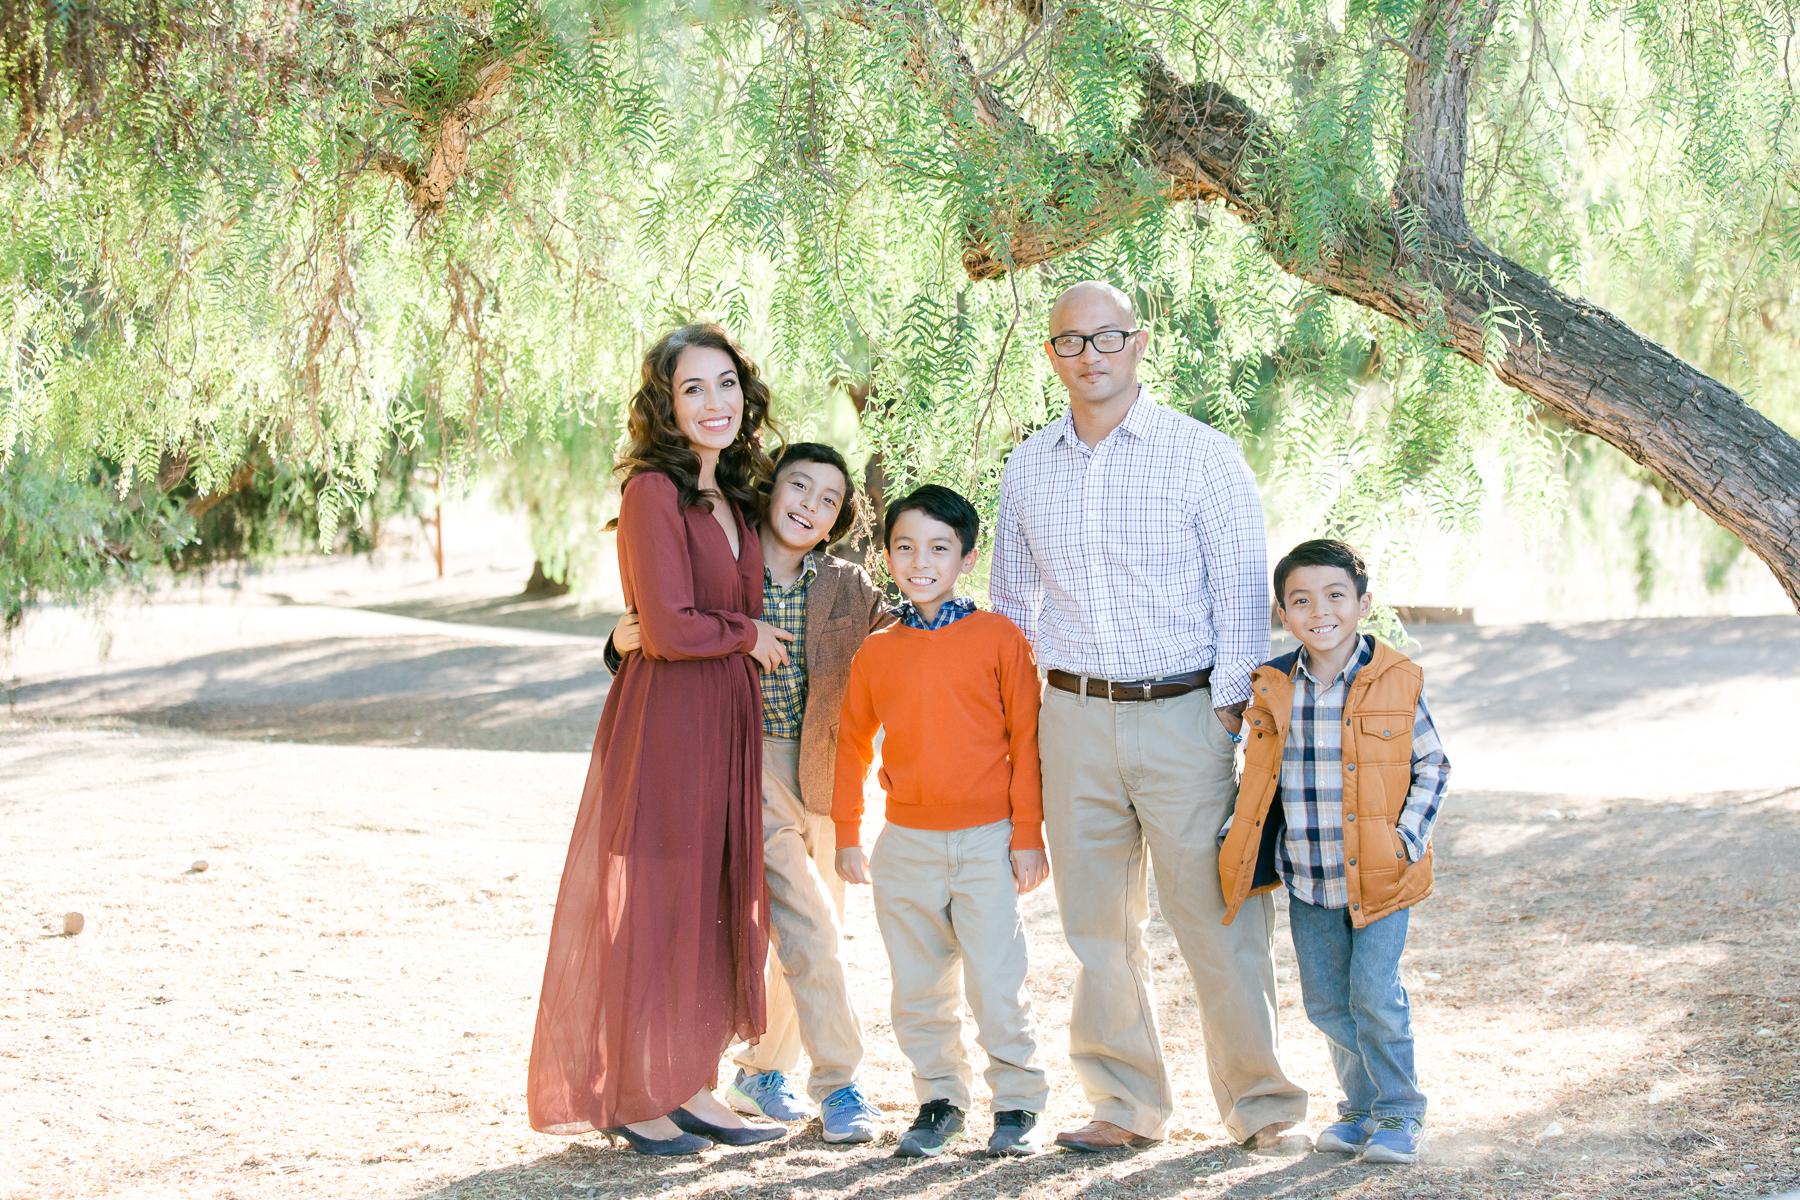 NEMA Photo I.Knightly024 - The Almodovar Family | Los Penasquitos canyon preserve | San Diego Photographer